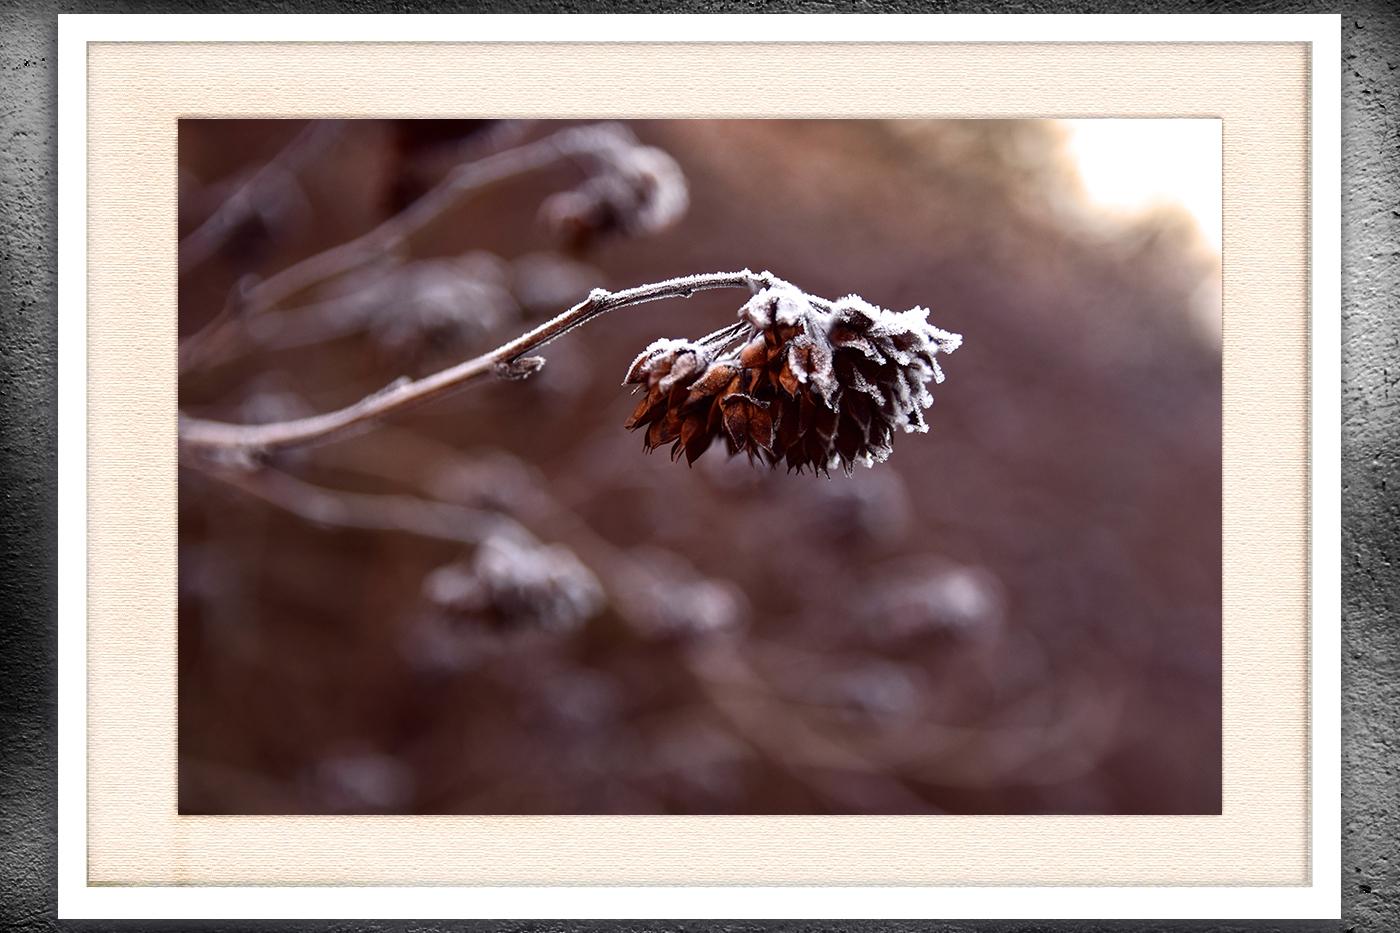 Nature photo, flora photo, twig photo, winter photo example image 3